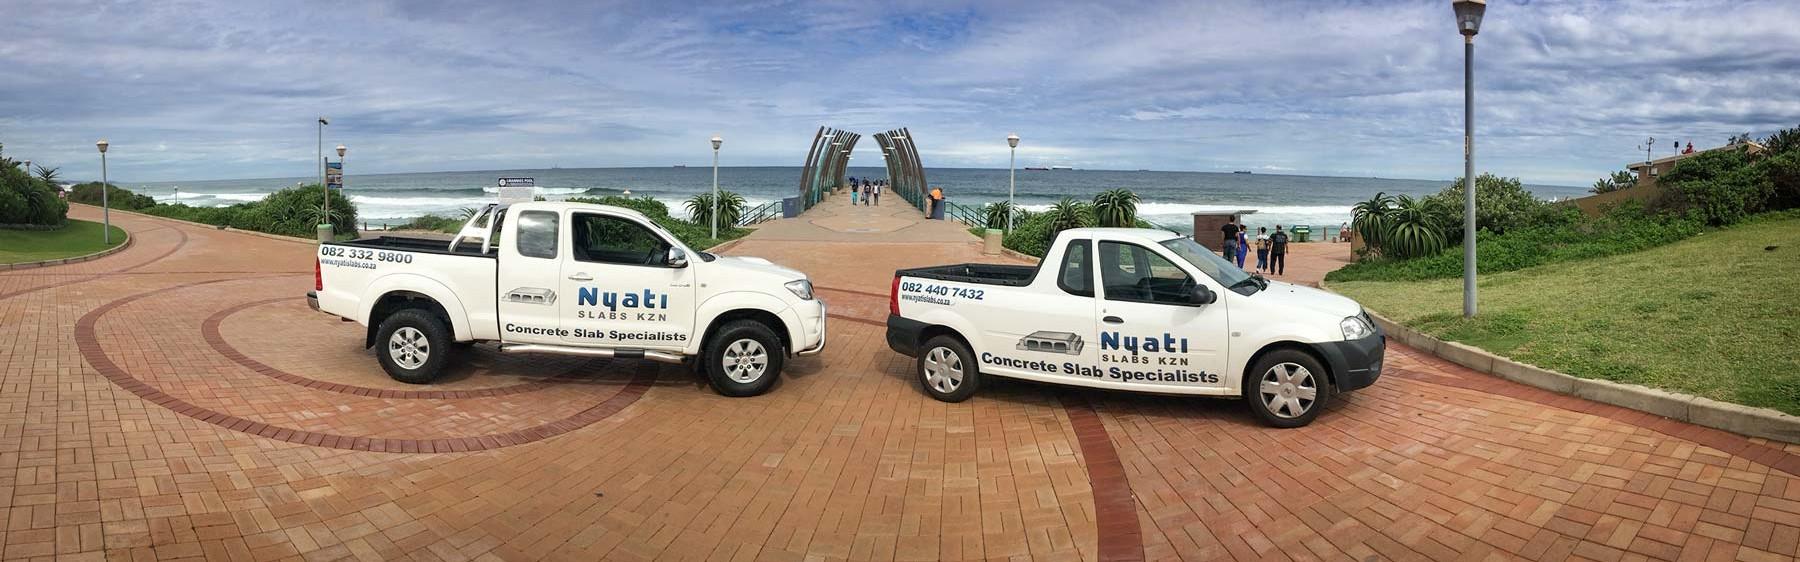 Nyati-Slabs-Fleet-1800x562